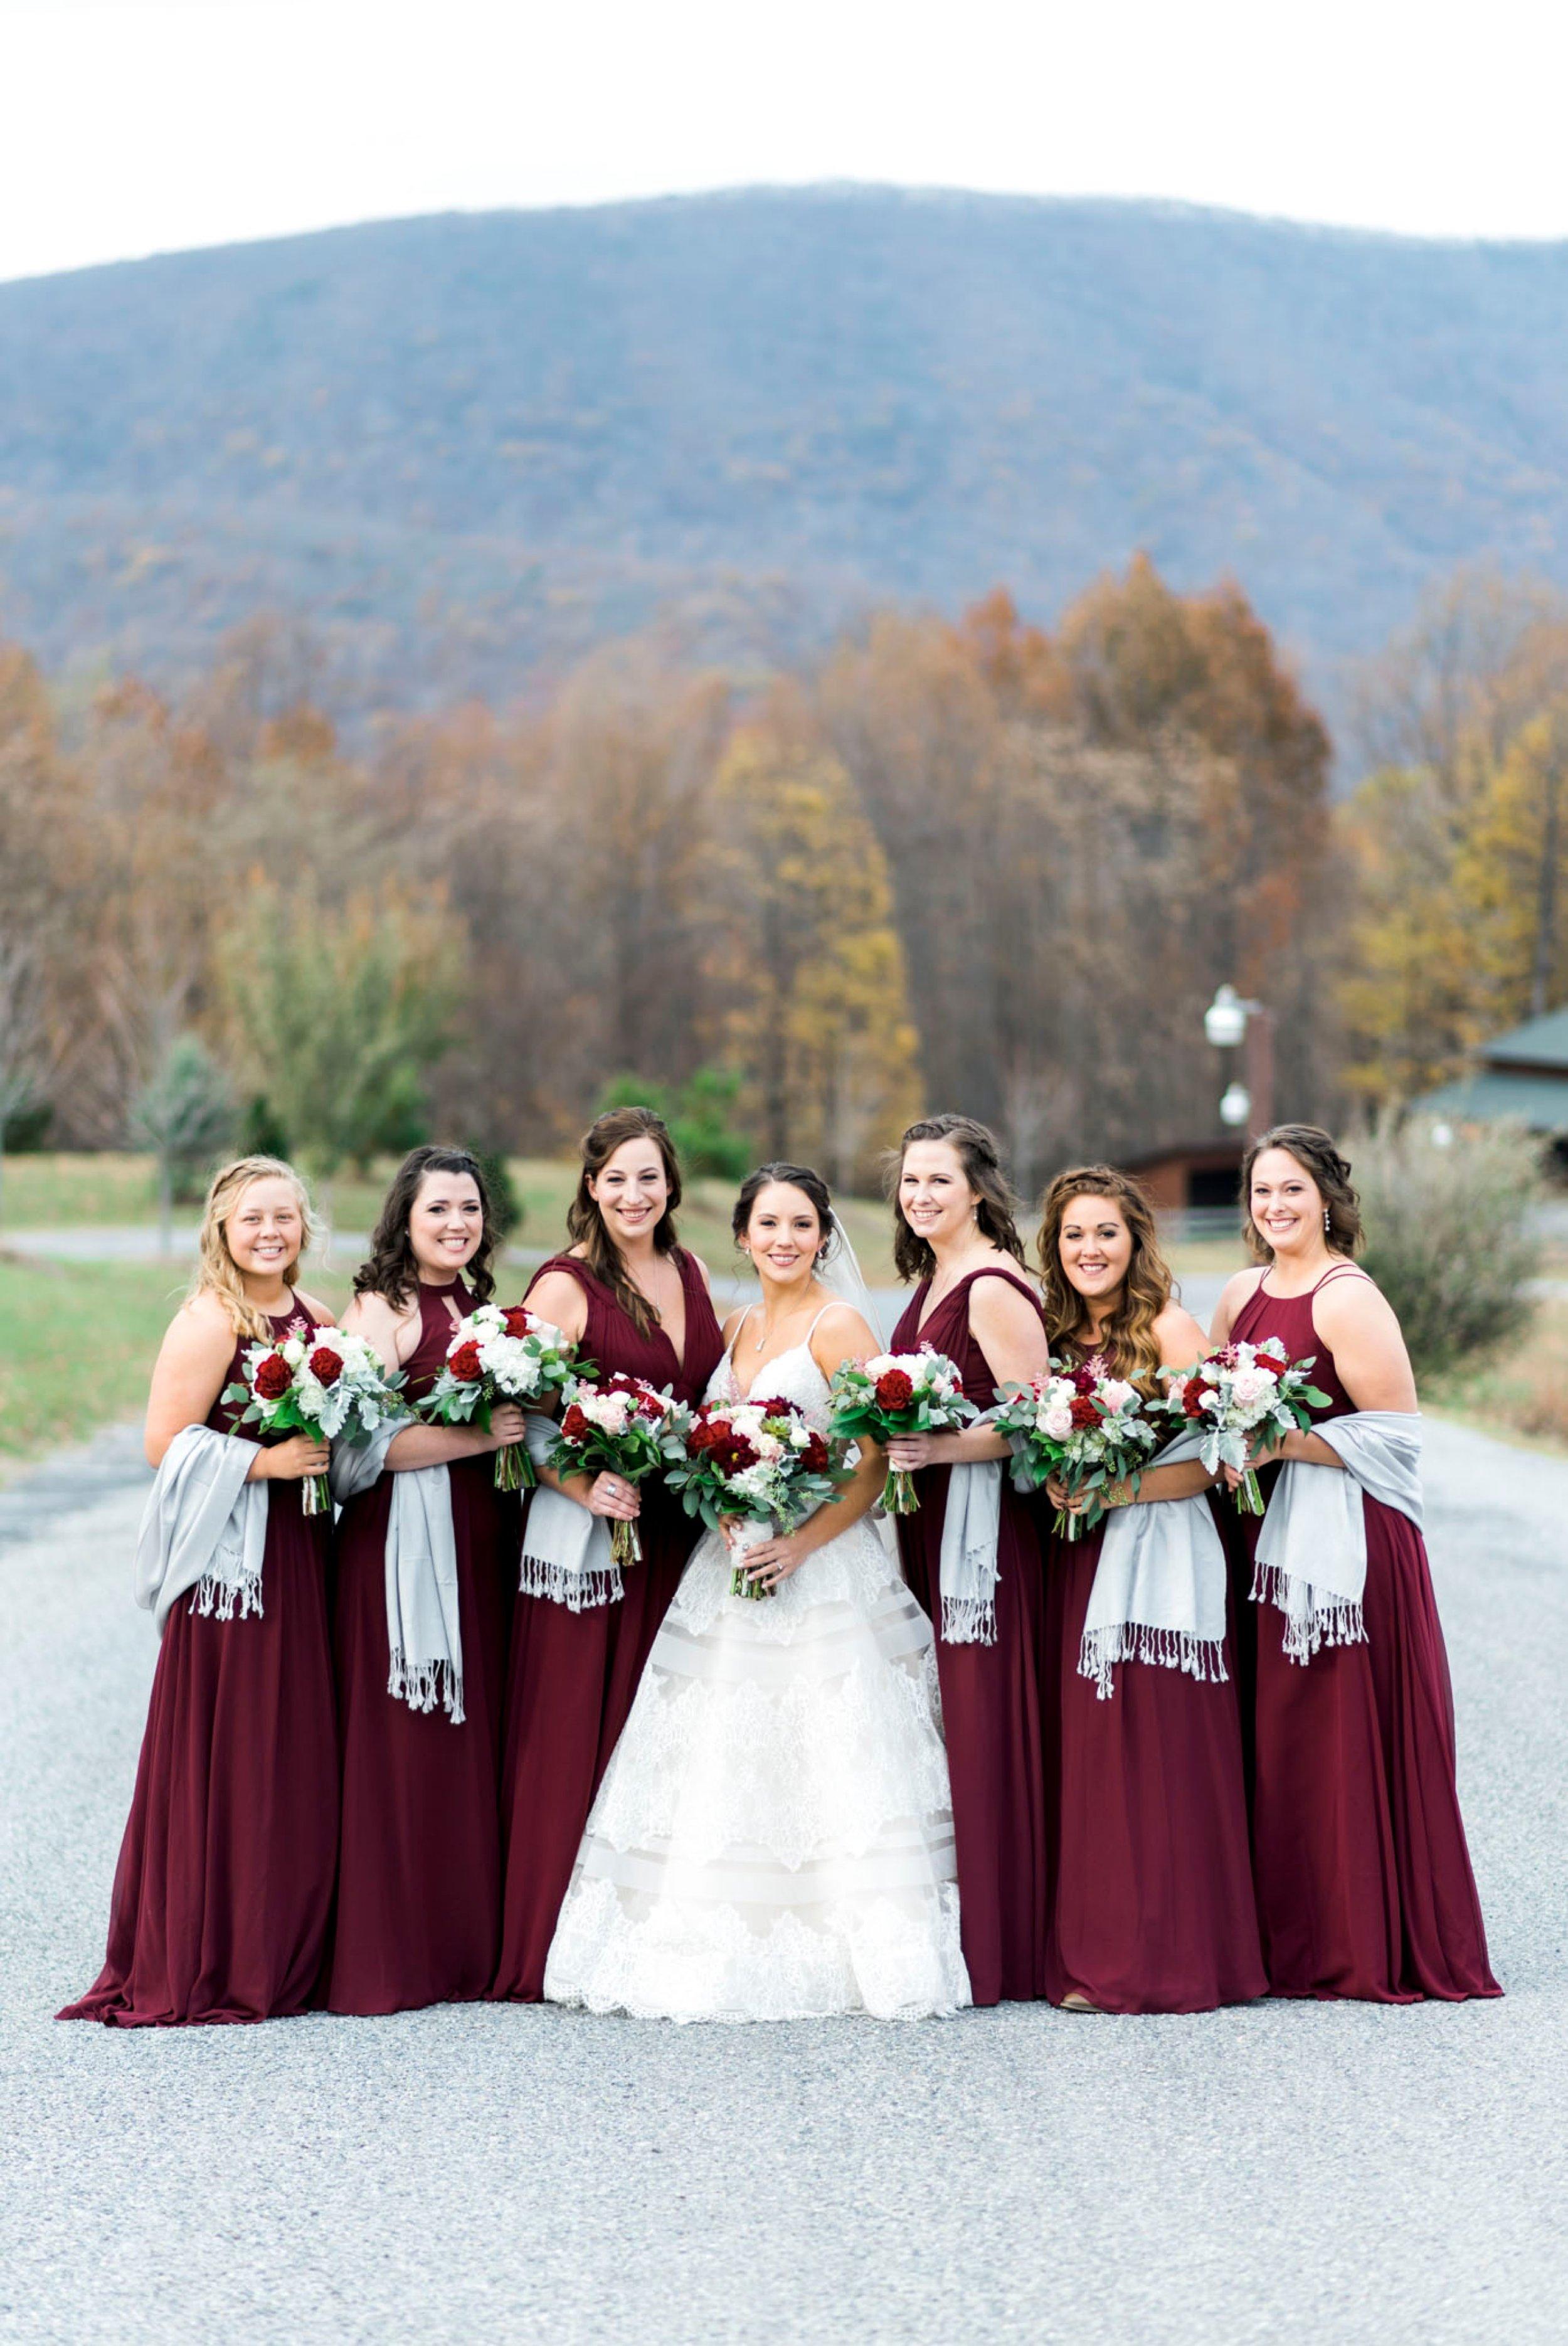 IrvineEstate_LexingtonVA_Wedding_FallWedding_VirginiaWeddingPhotographer 40.jpg